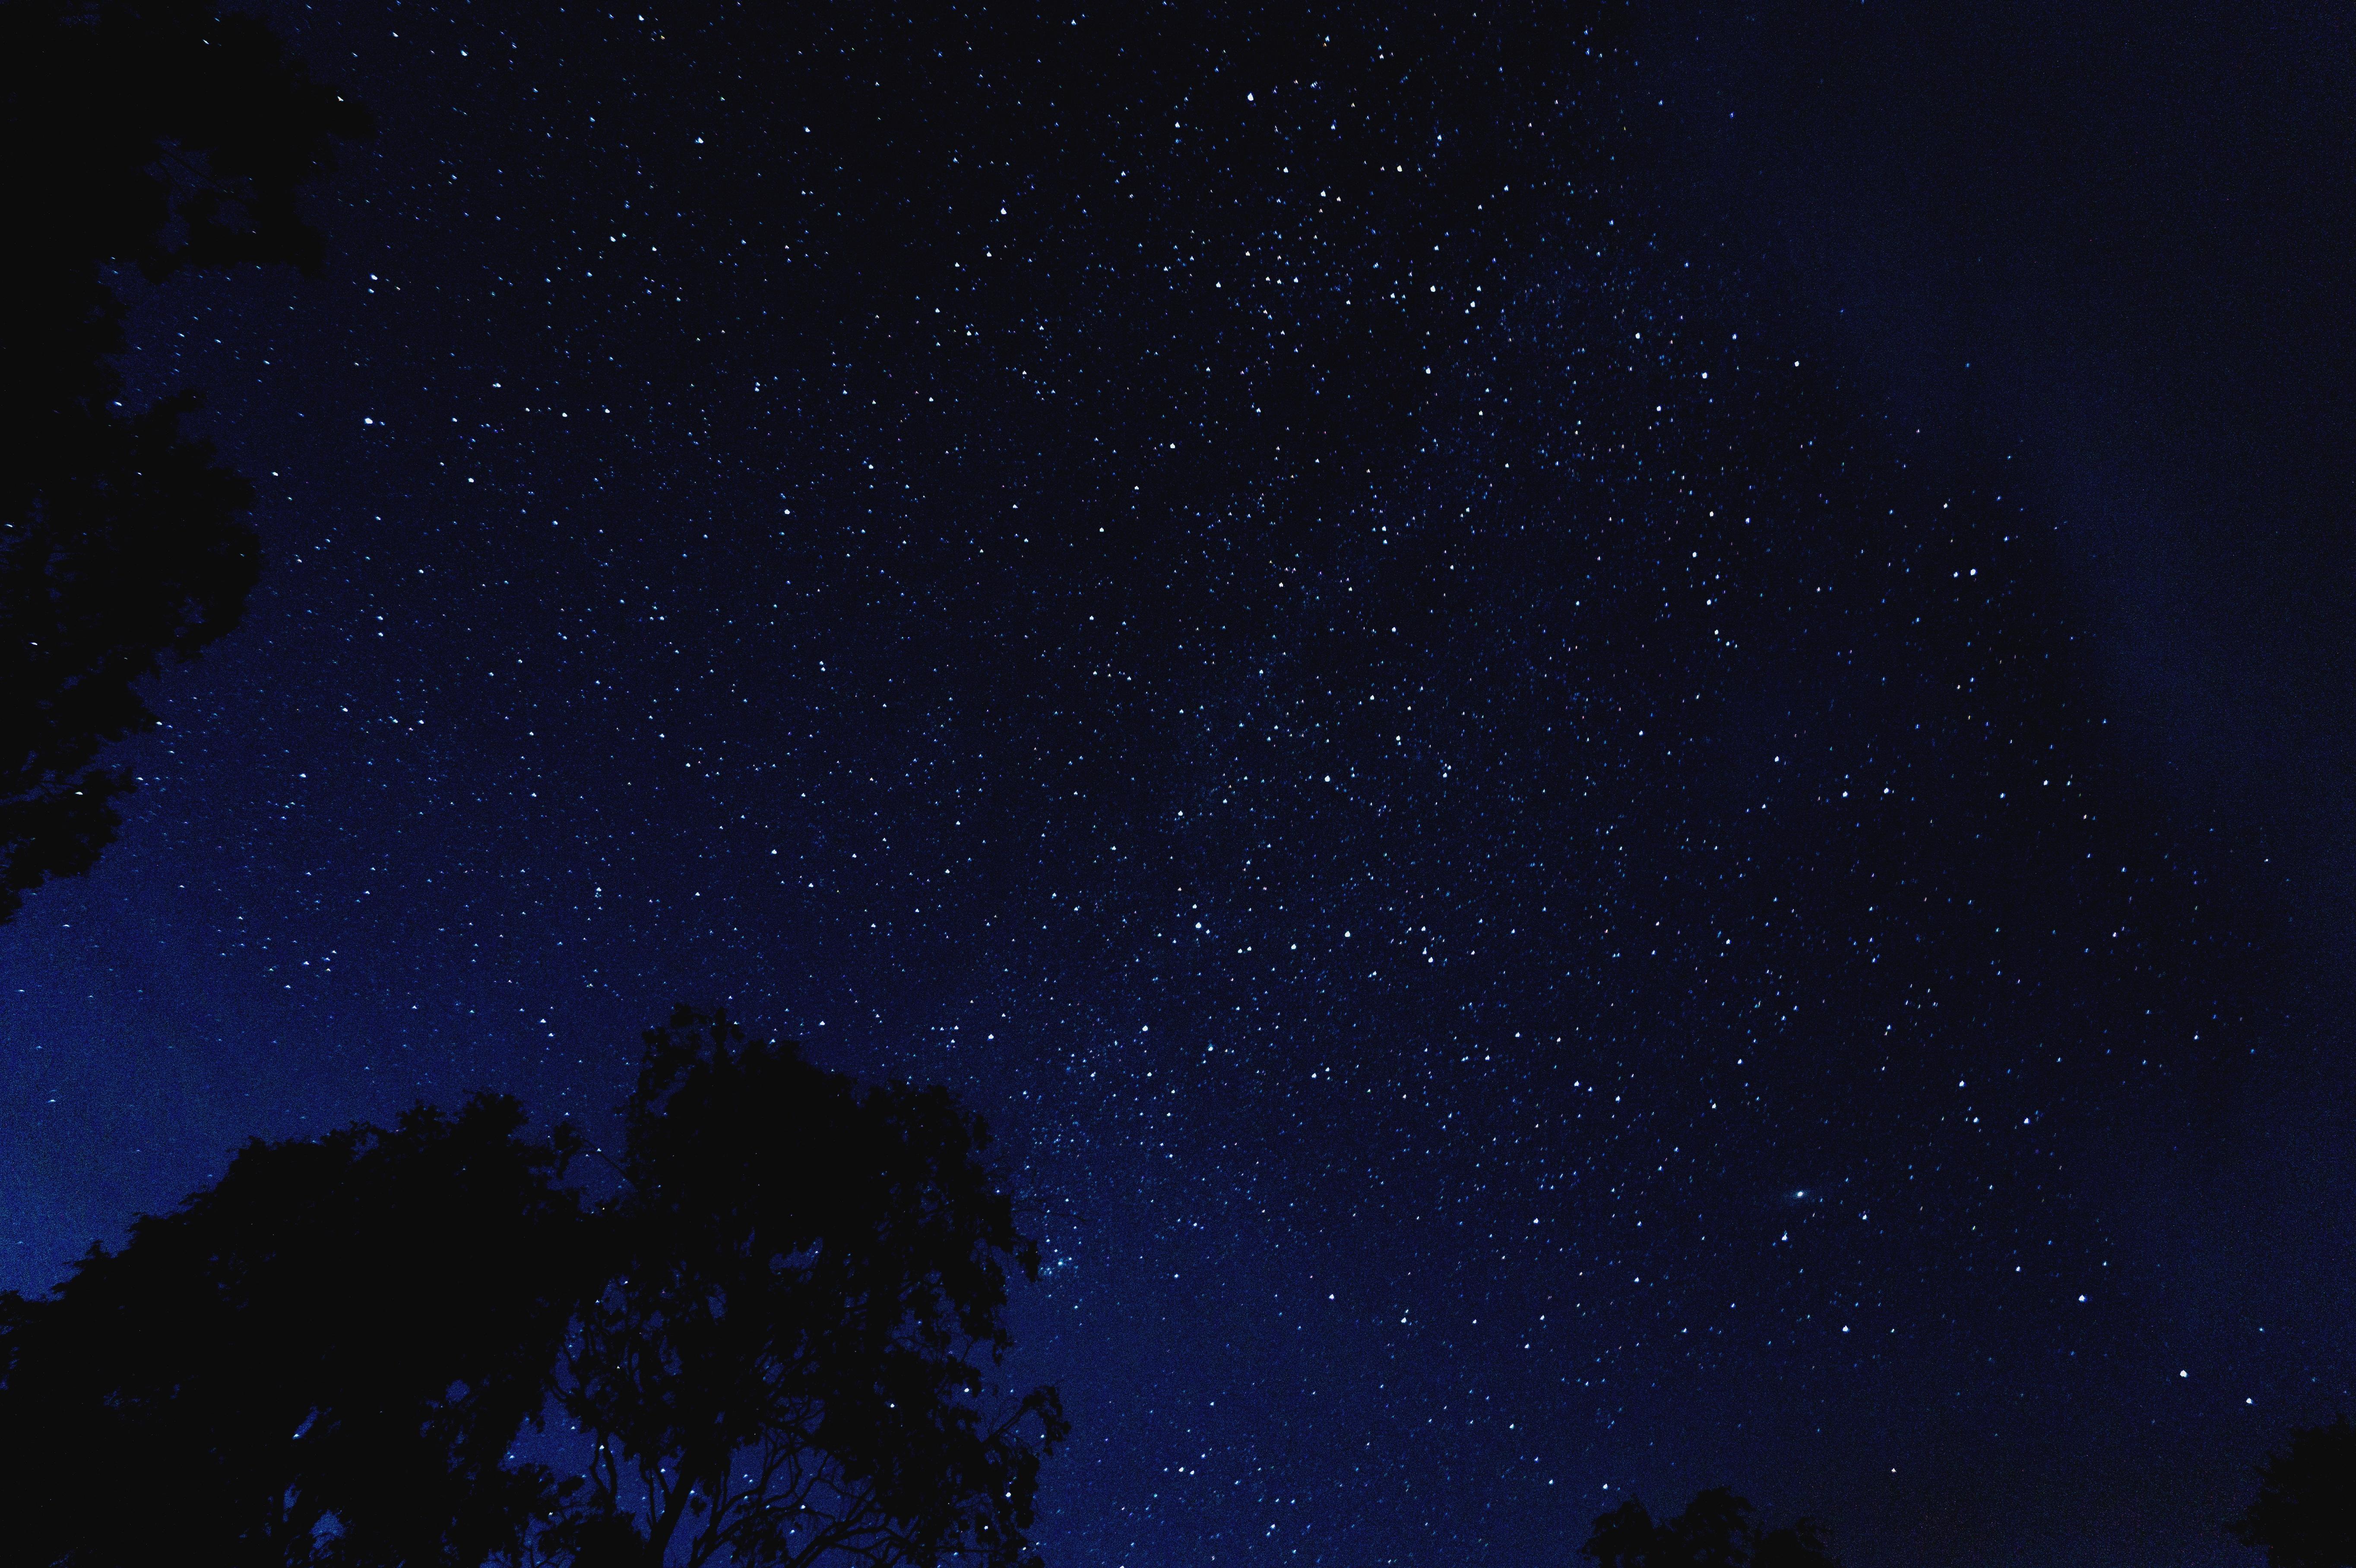 Free Images : Night, Atmosphere, Dark, Idyllic, Evening